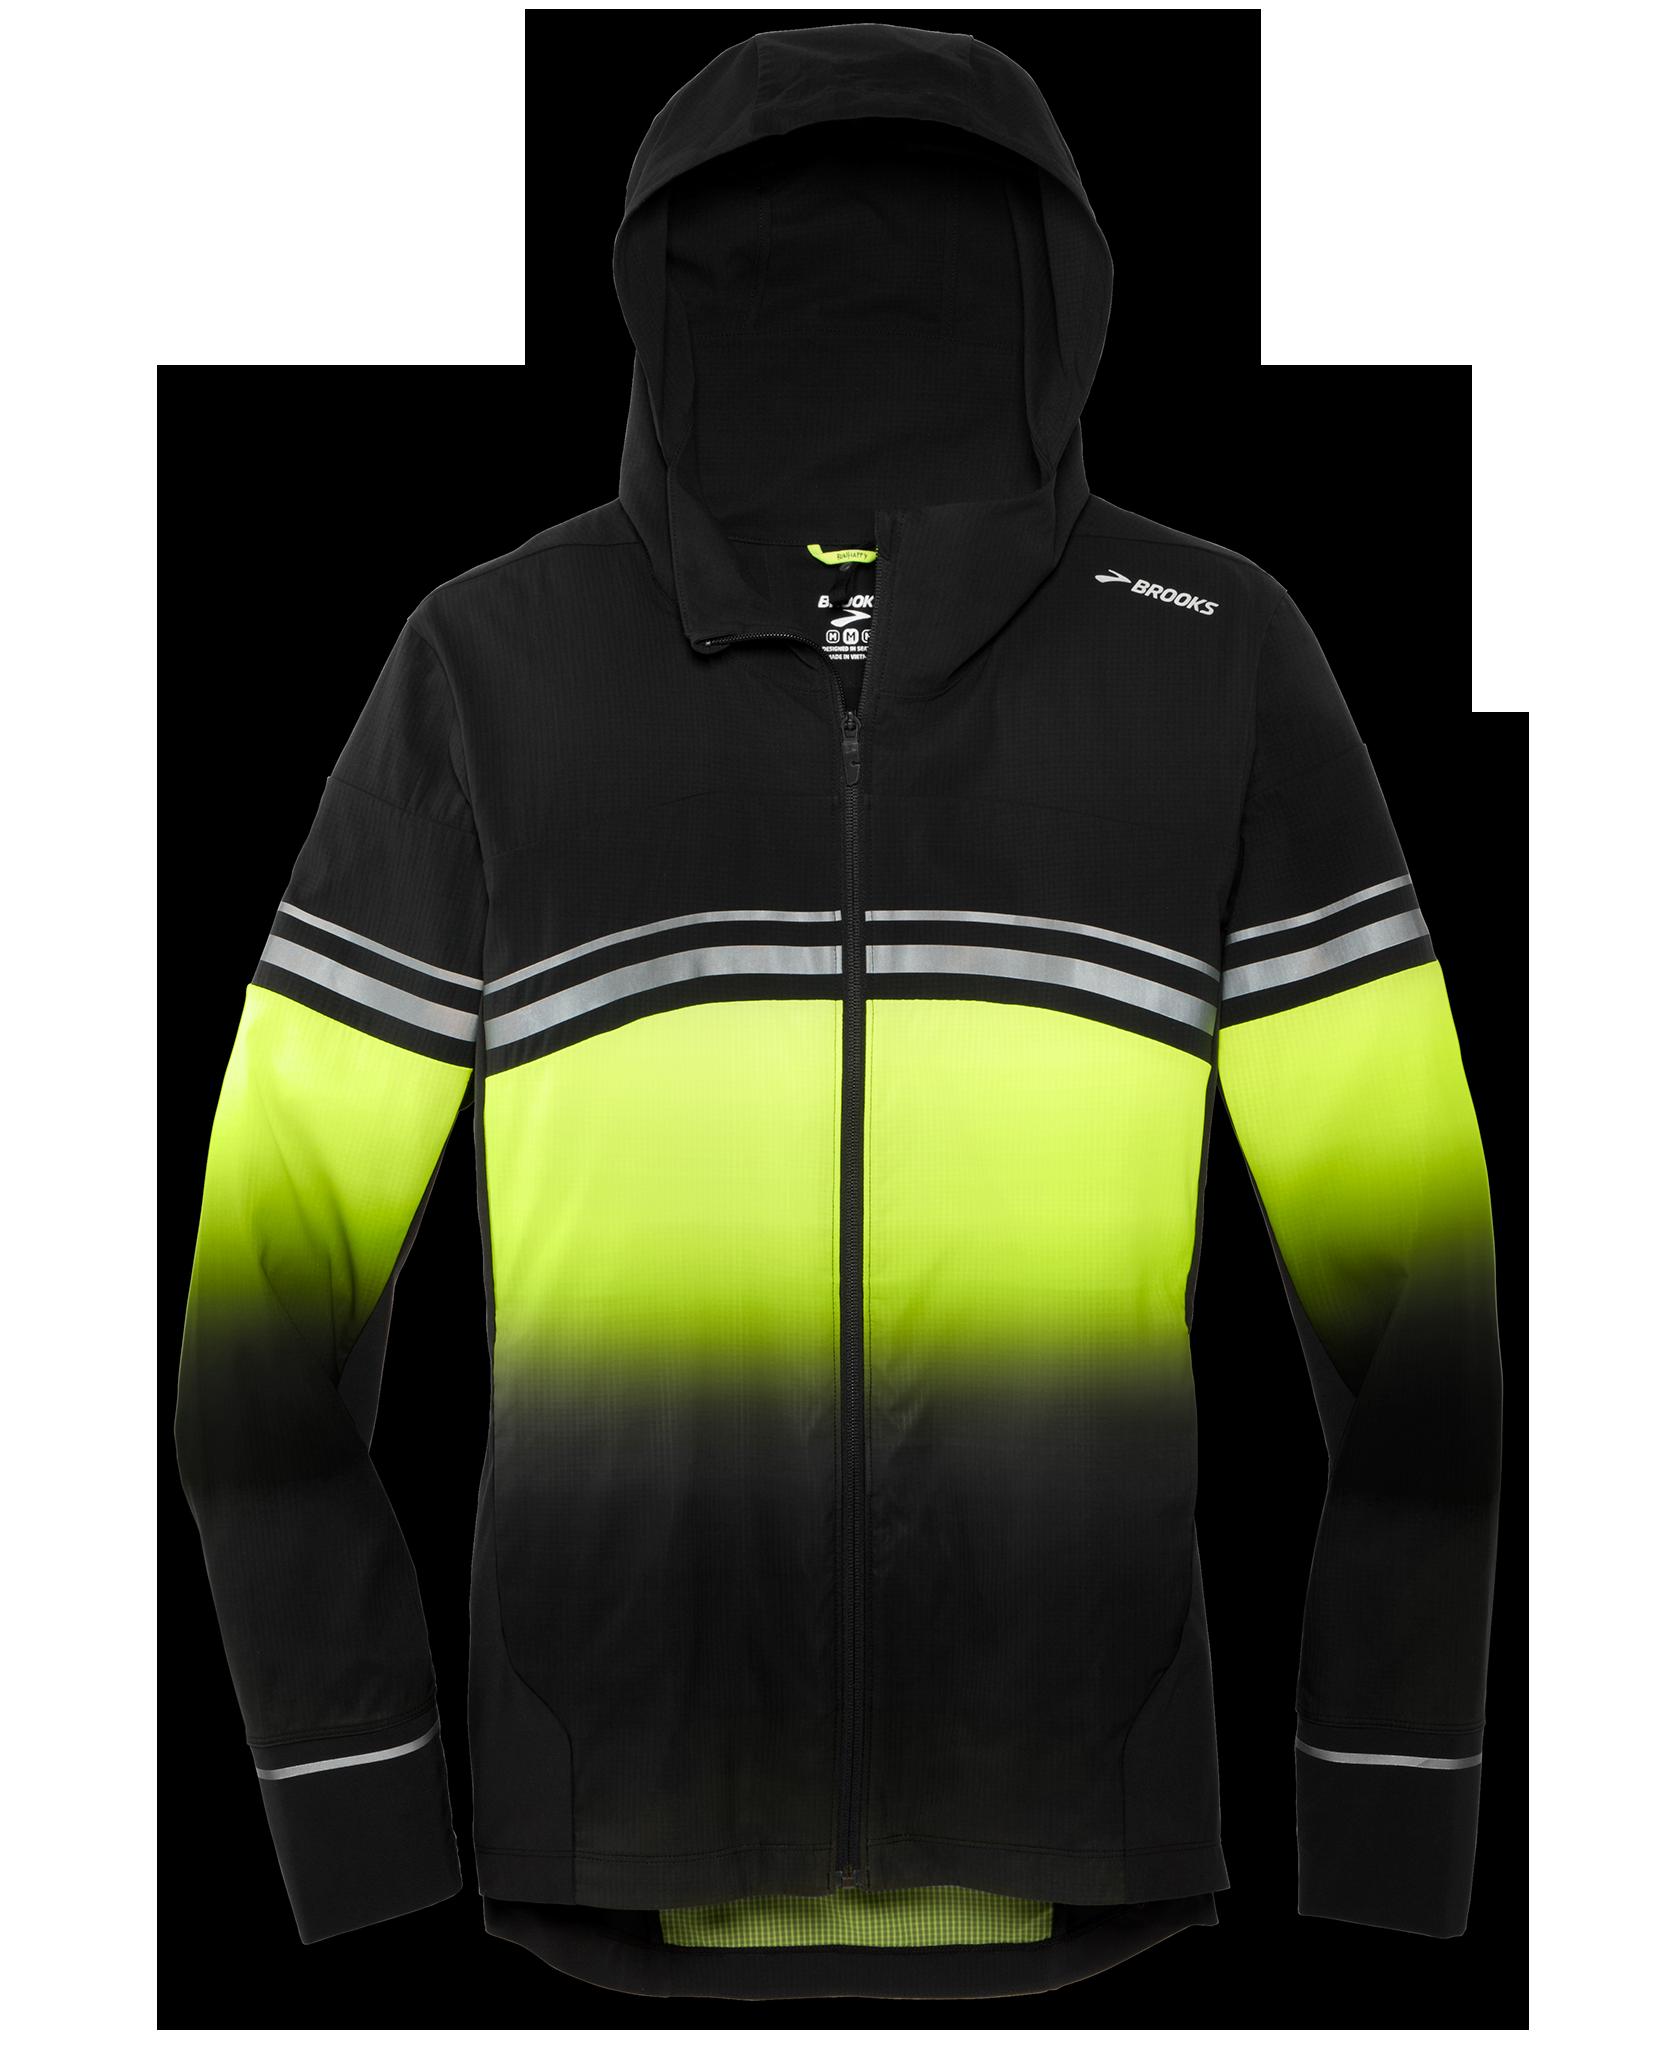 W Brooks Nightlife Canopy Jacket